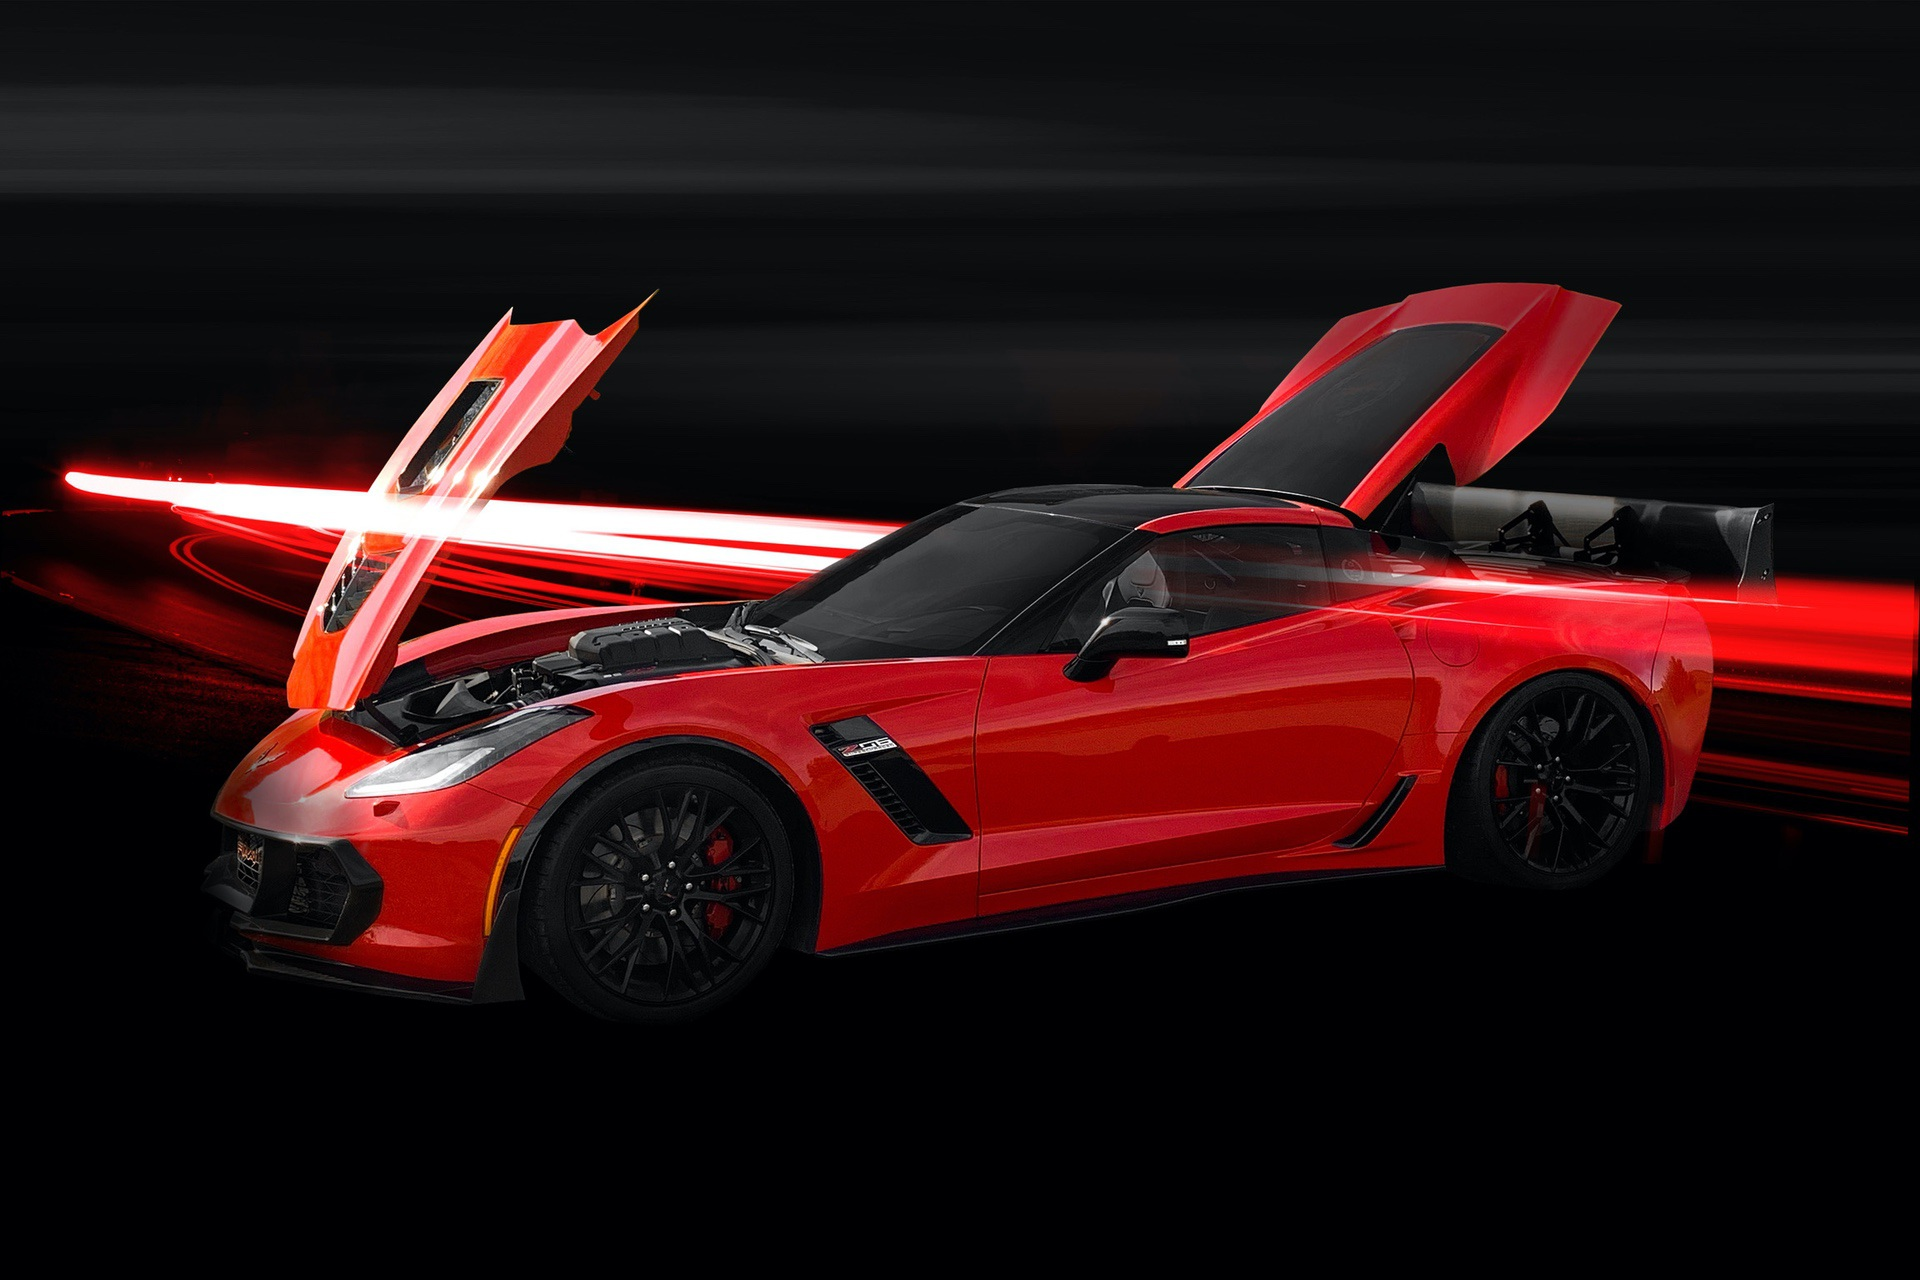 Callaway_C7_Corvette_limited_edition_0003